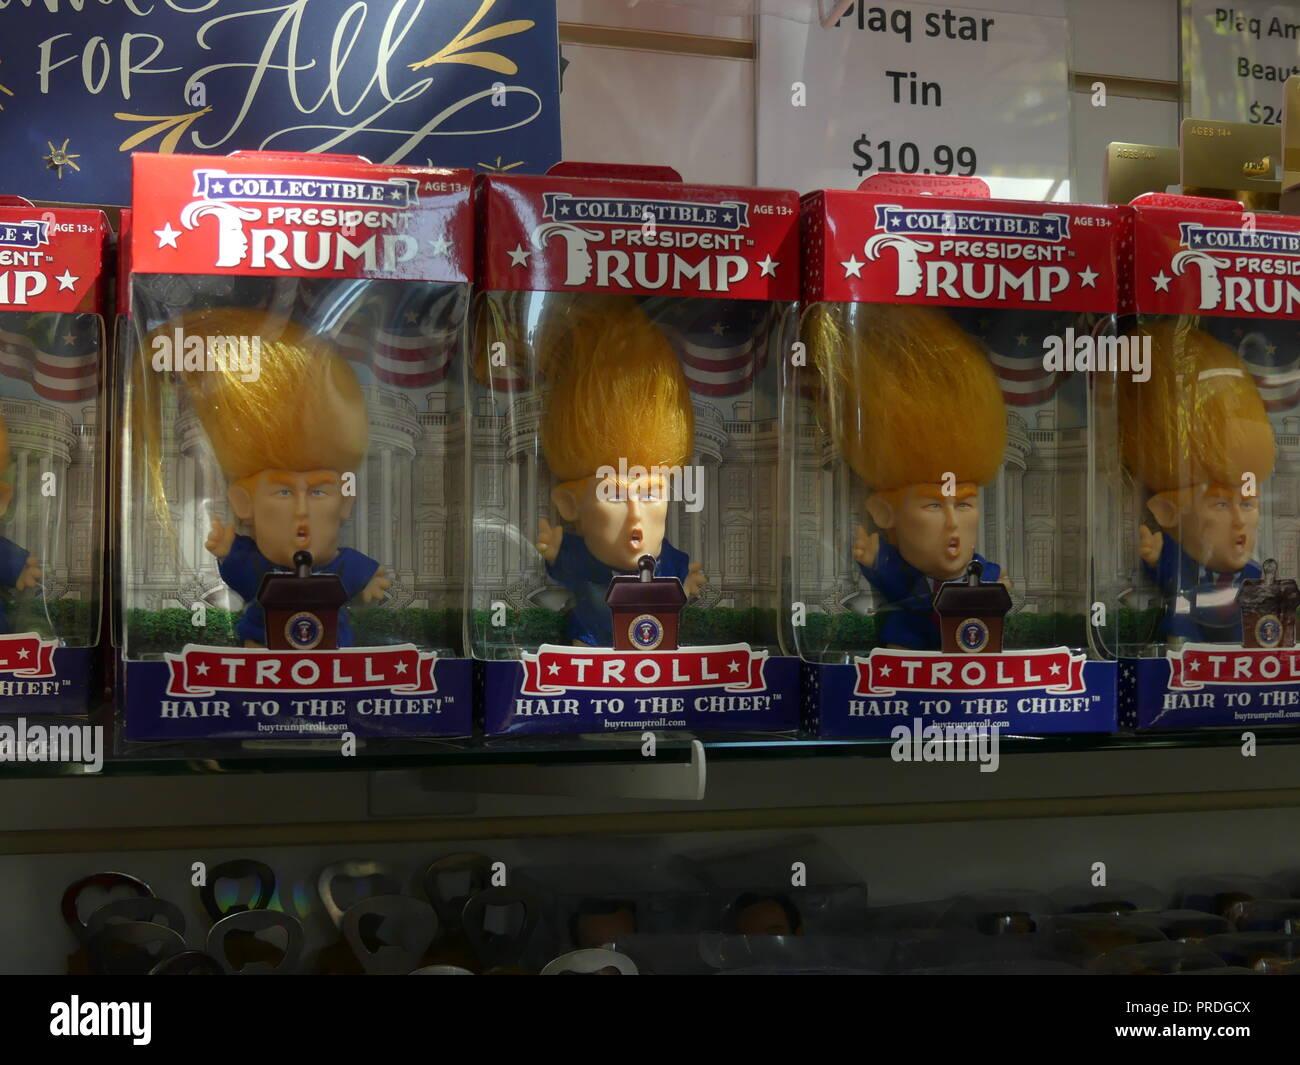 PRESIDENT DONALD TRUMP MEMORABILIA in a Washington, D.C. store. Photo: Tony Gale - Stock Image